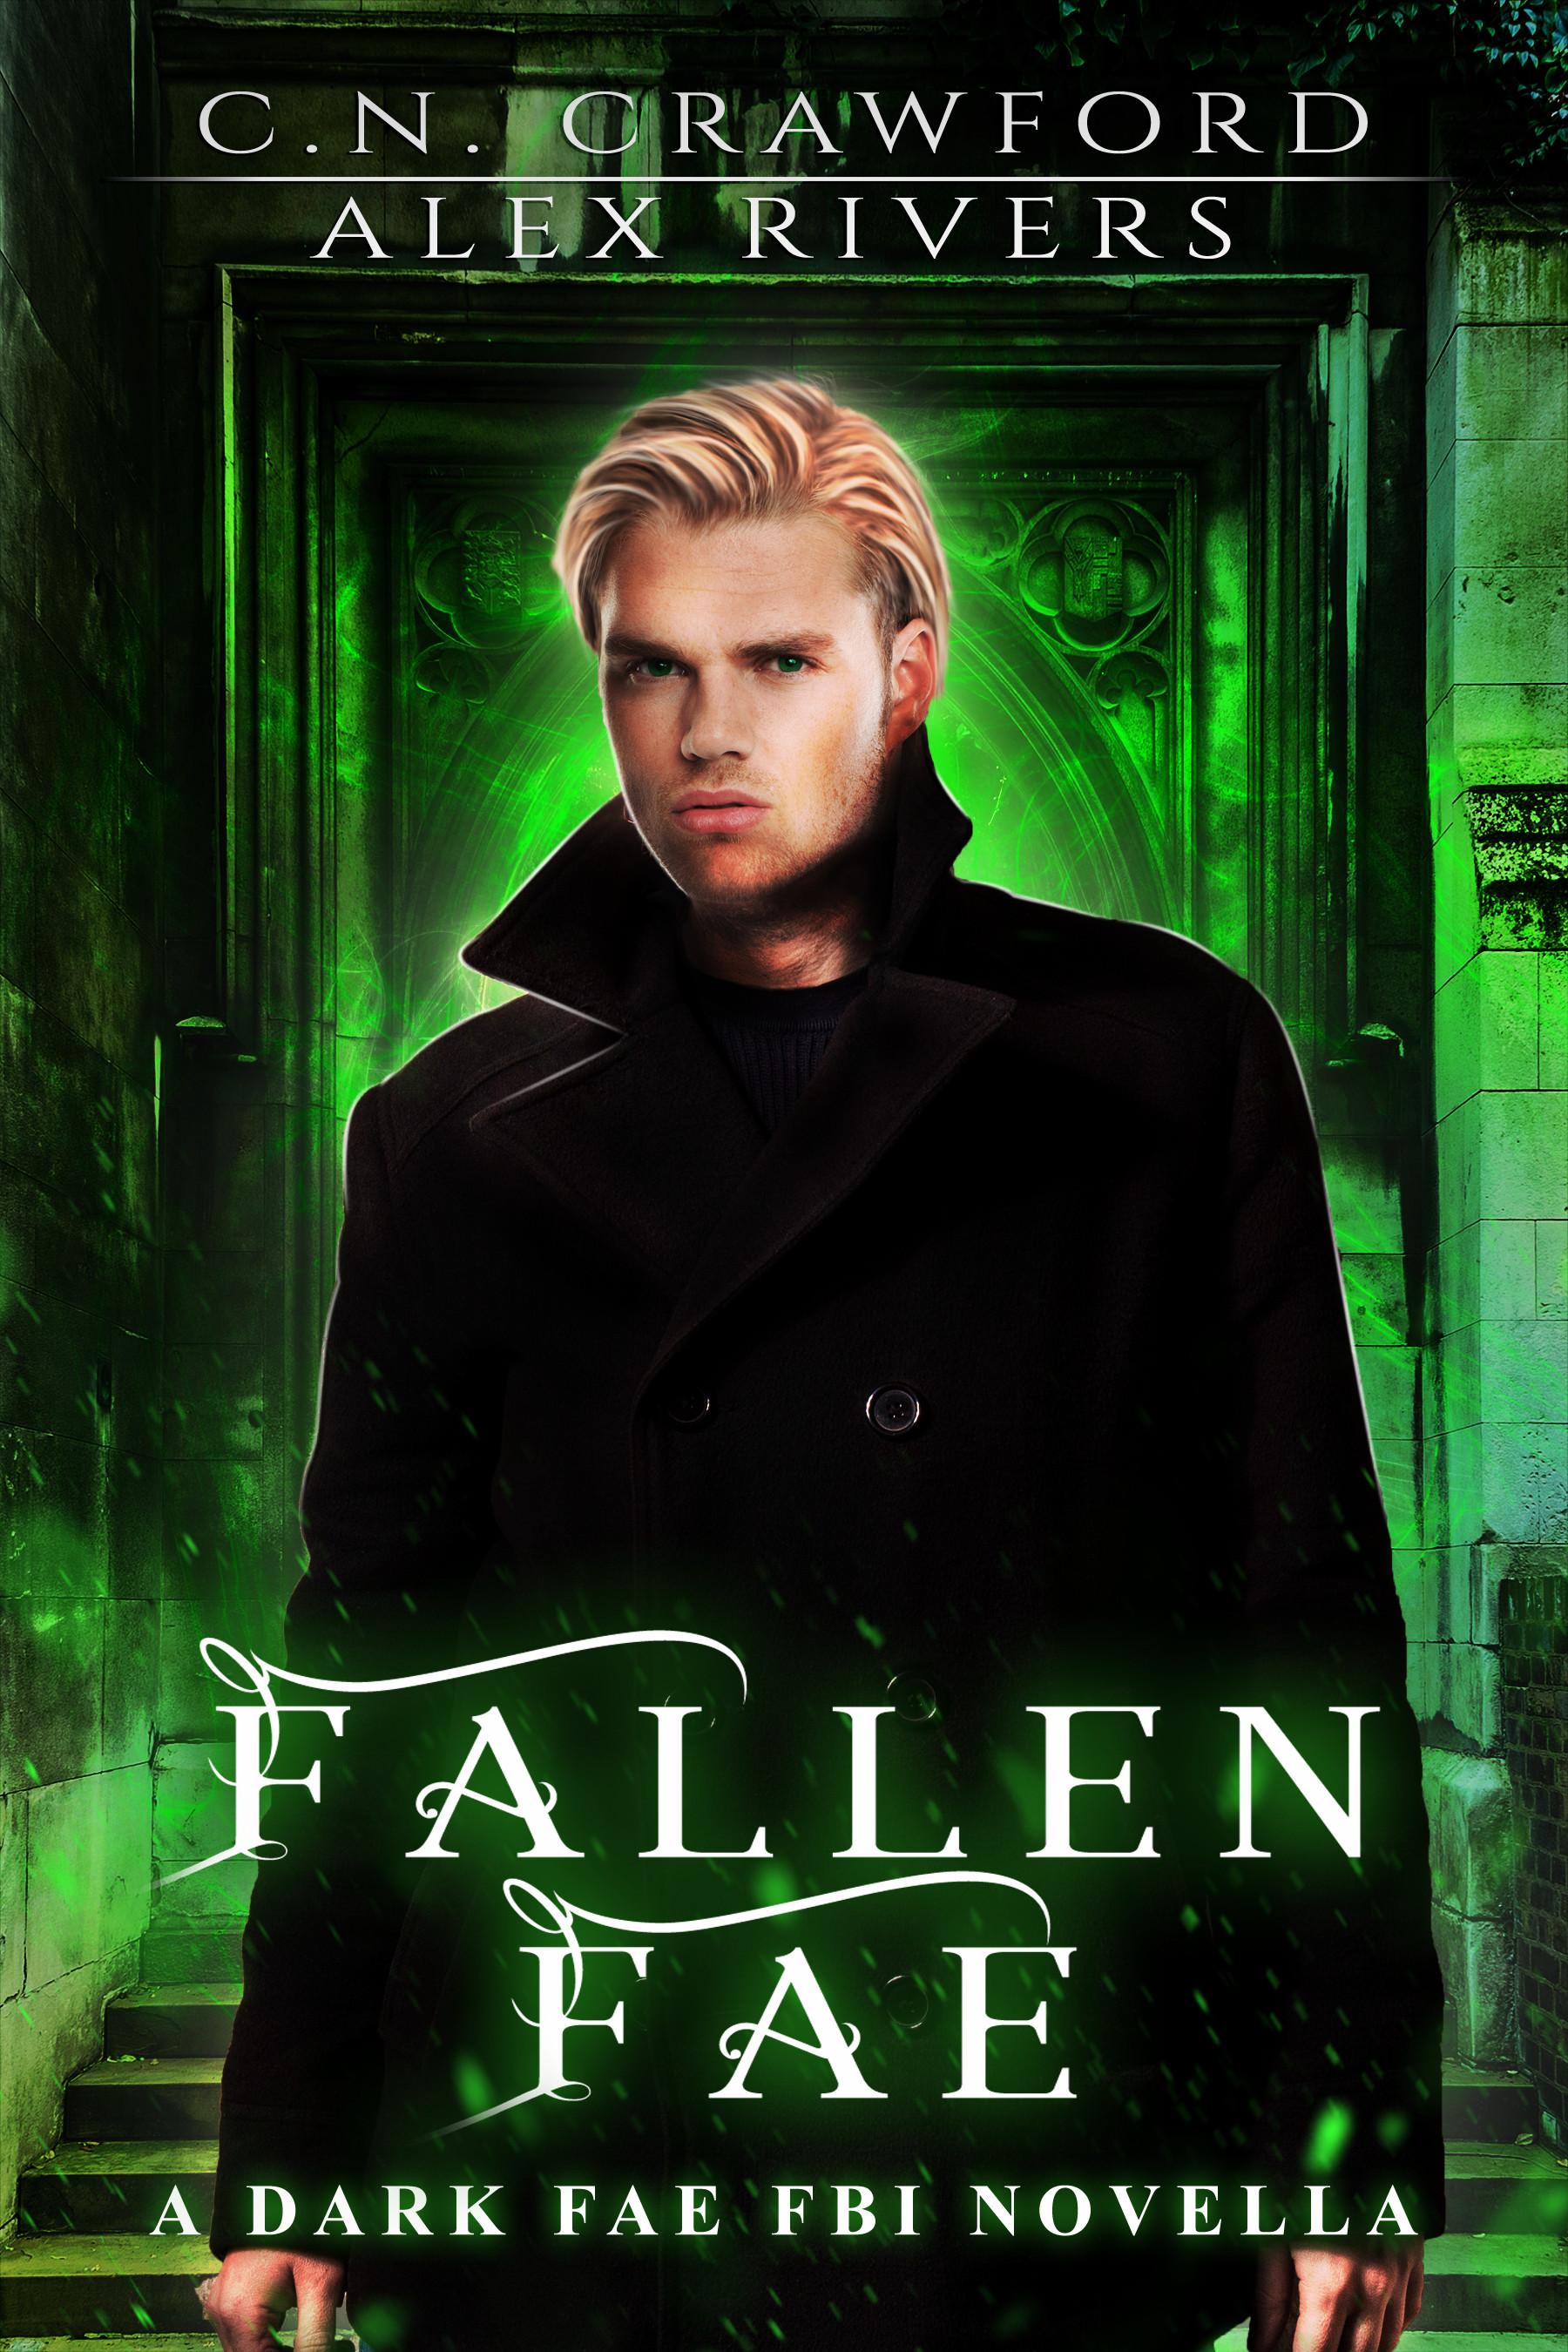 Book 1.1: Fallen Fae